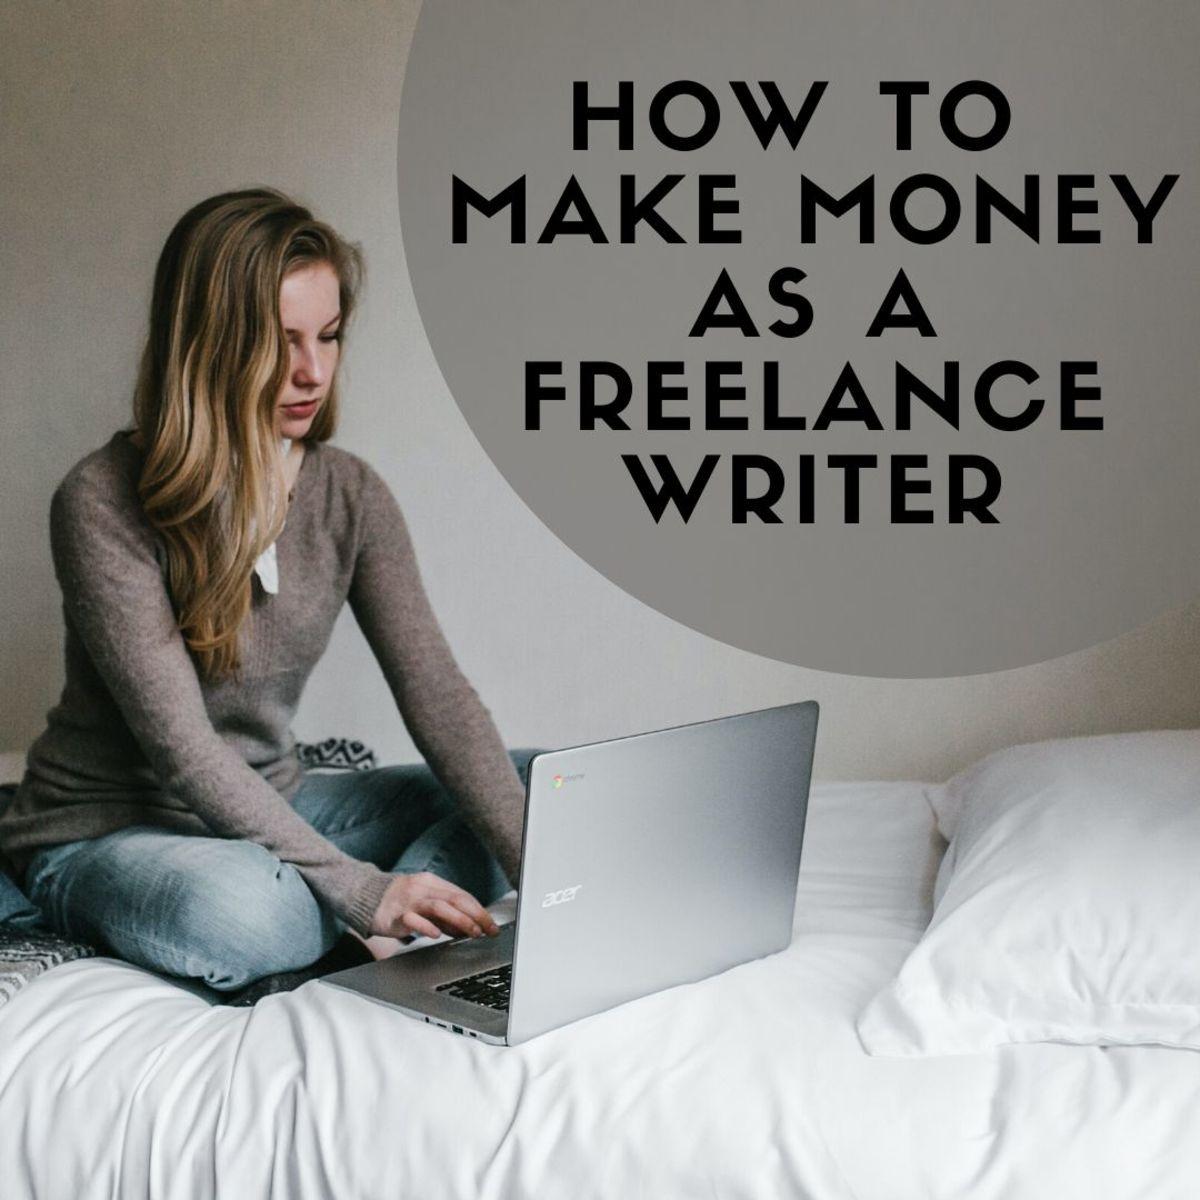 3 Ways to Make Money as a Freelance Writer